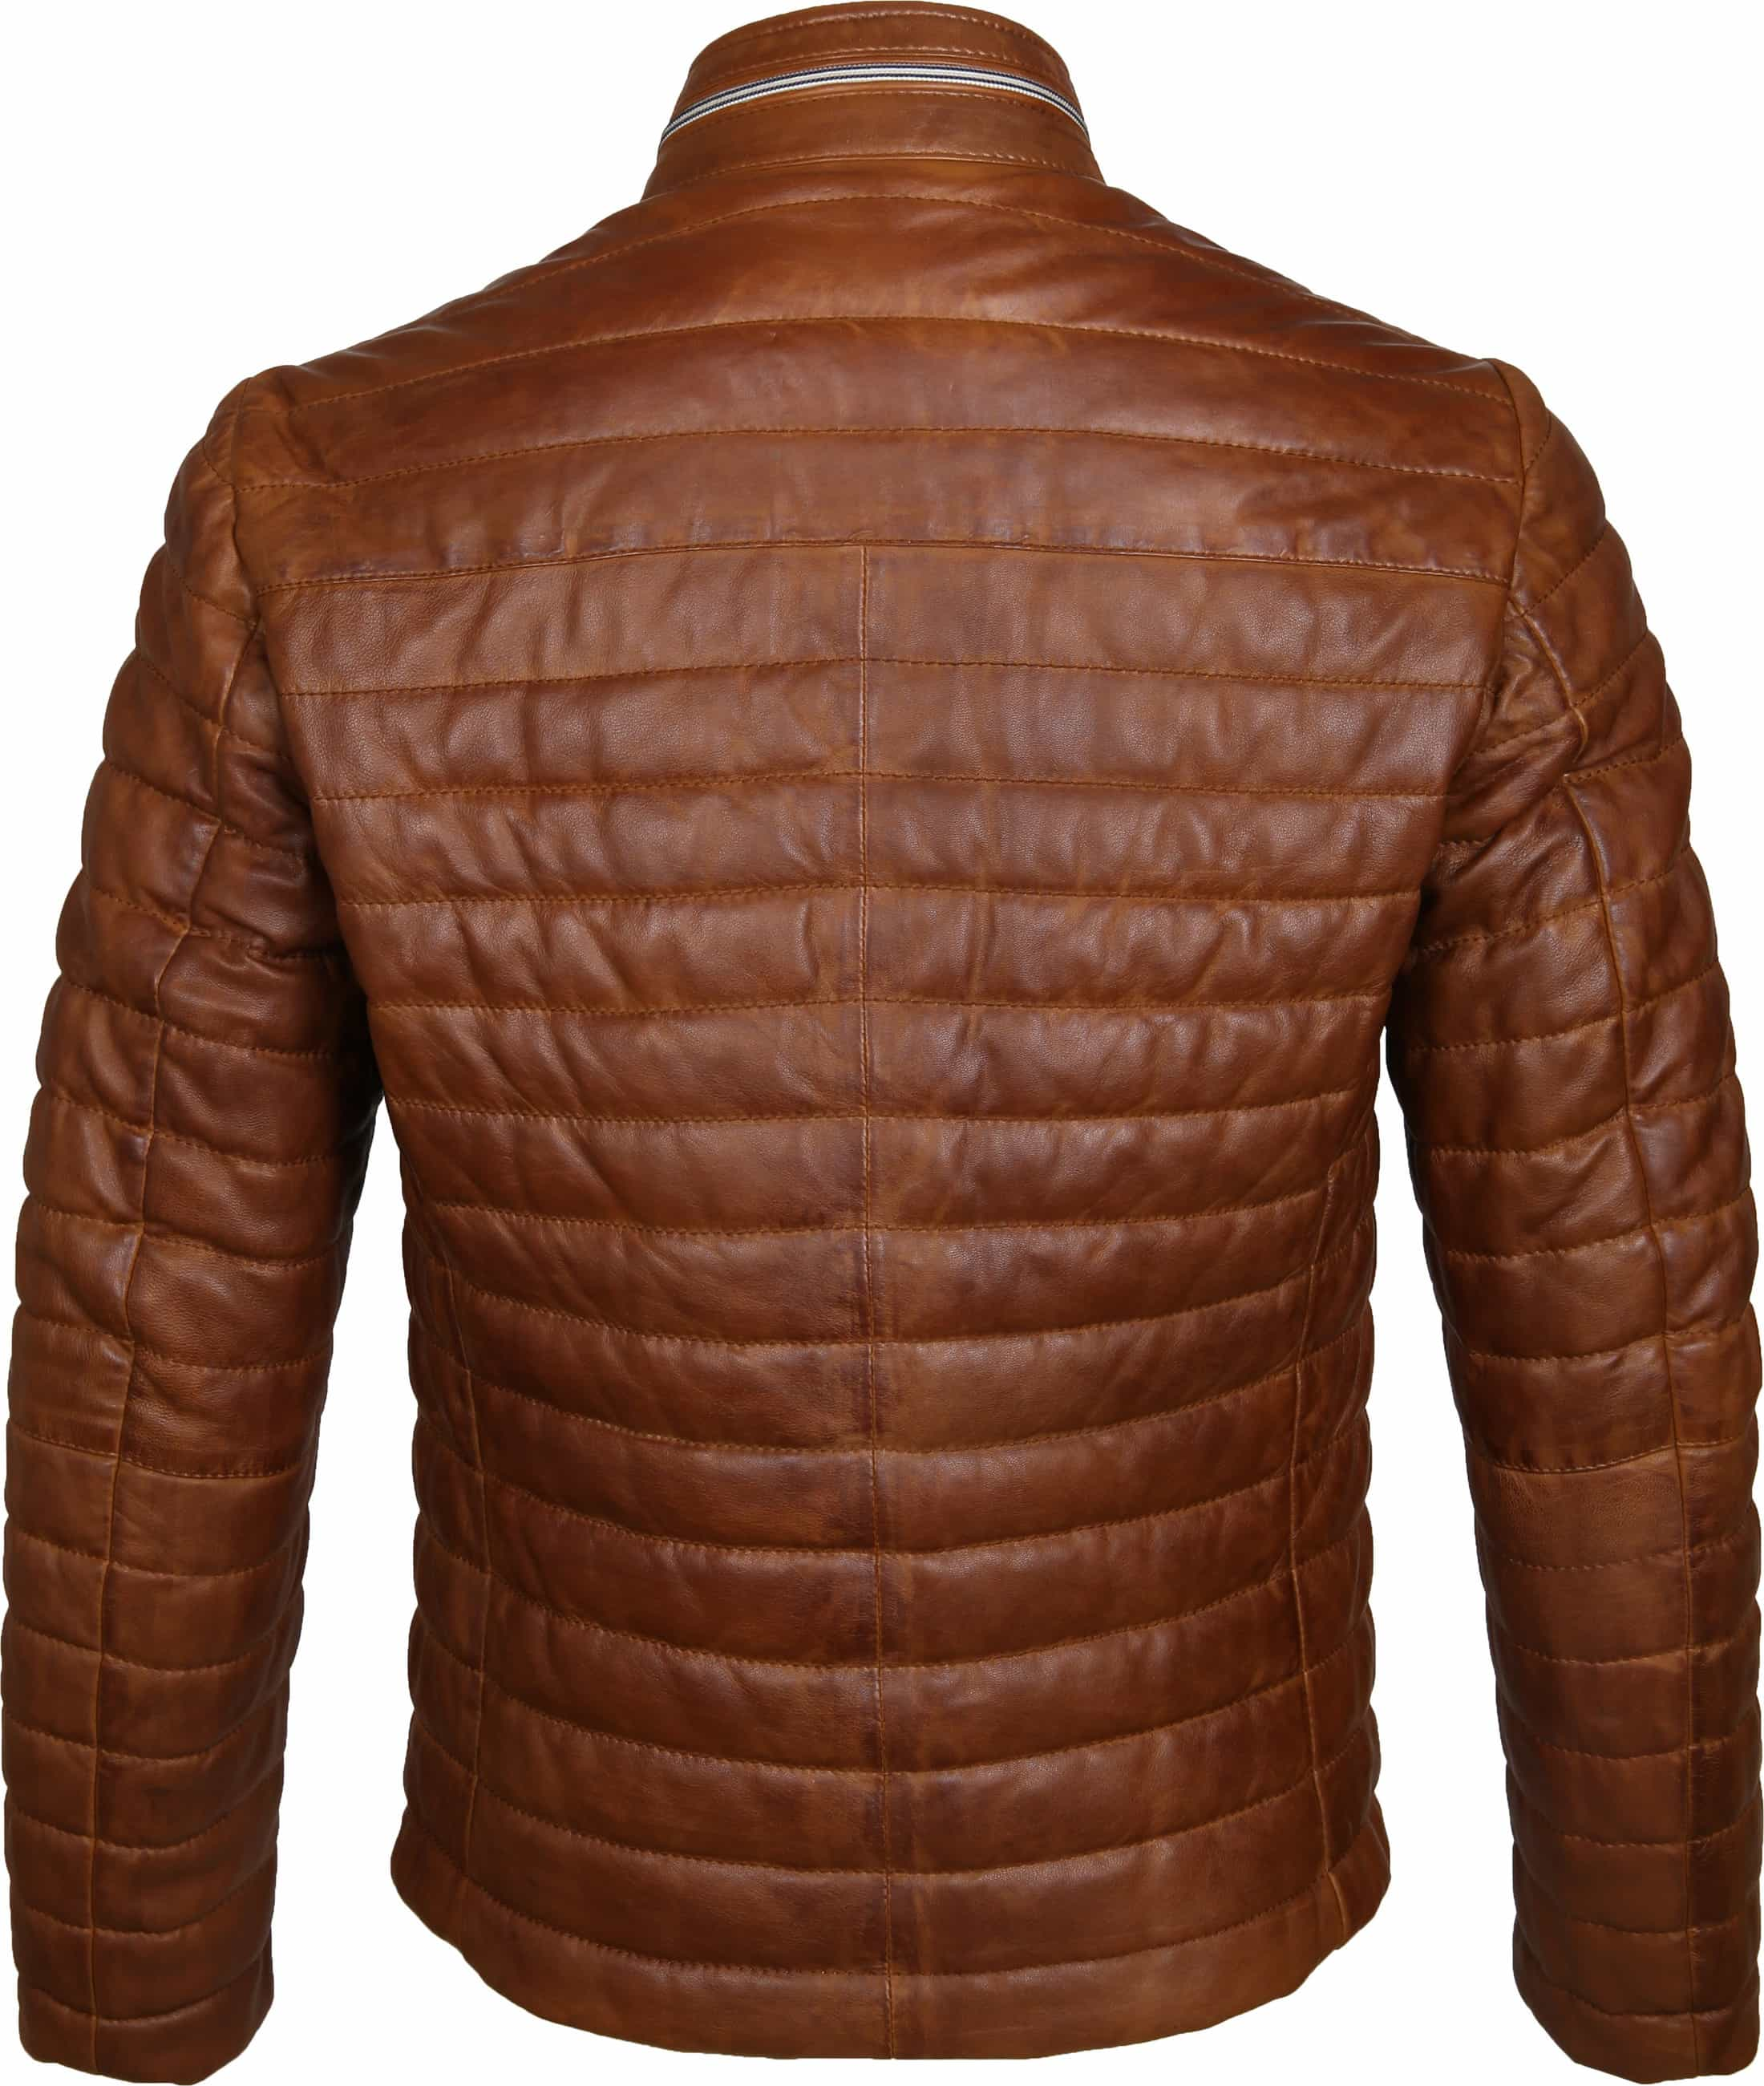 Milestone Tereno Leather Jacke Cognac foto 5